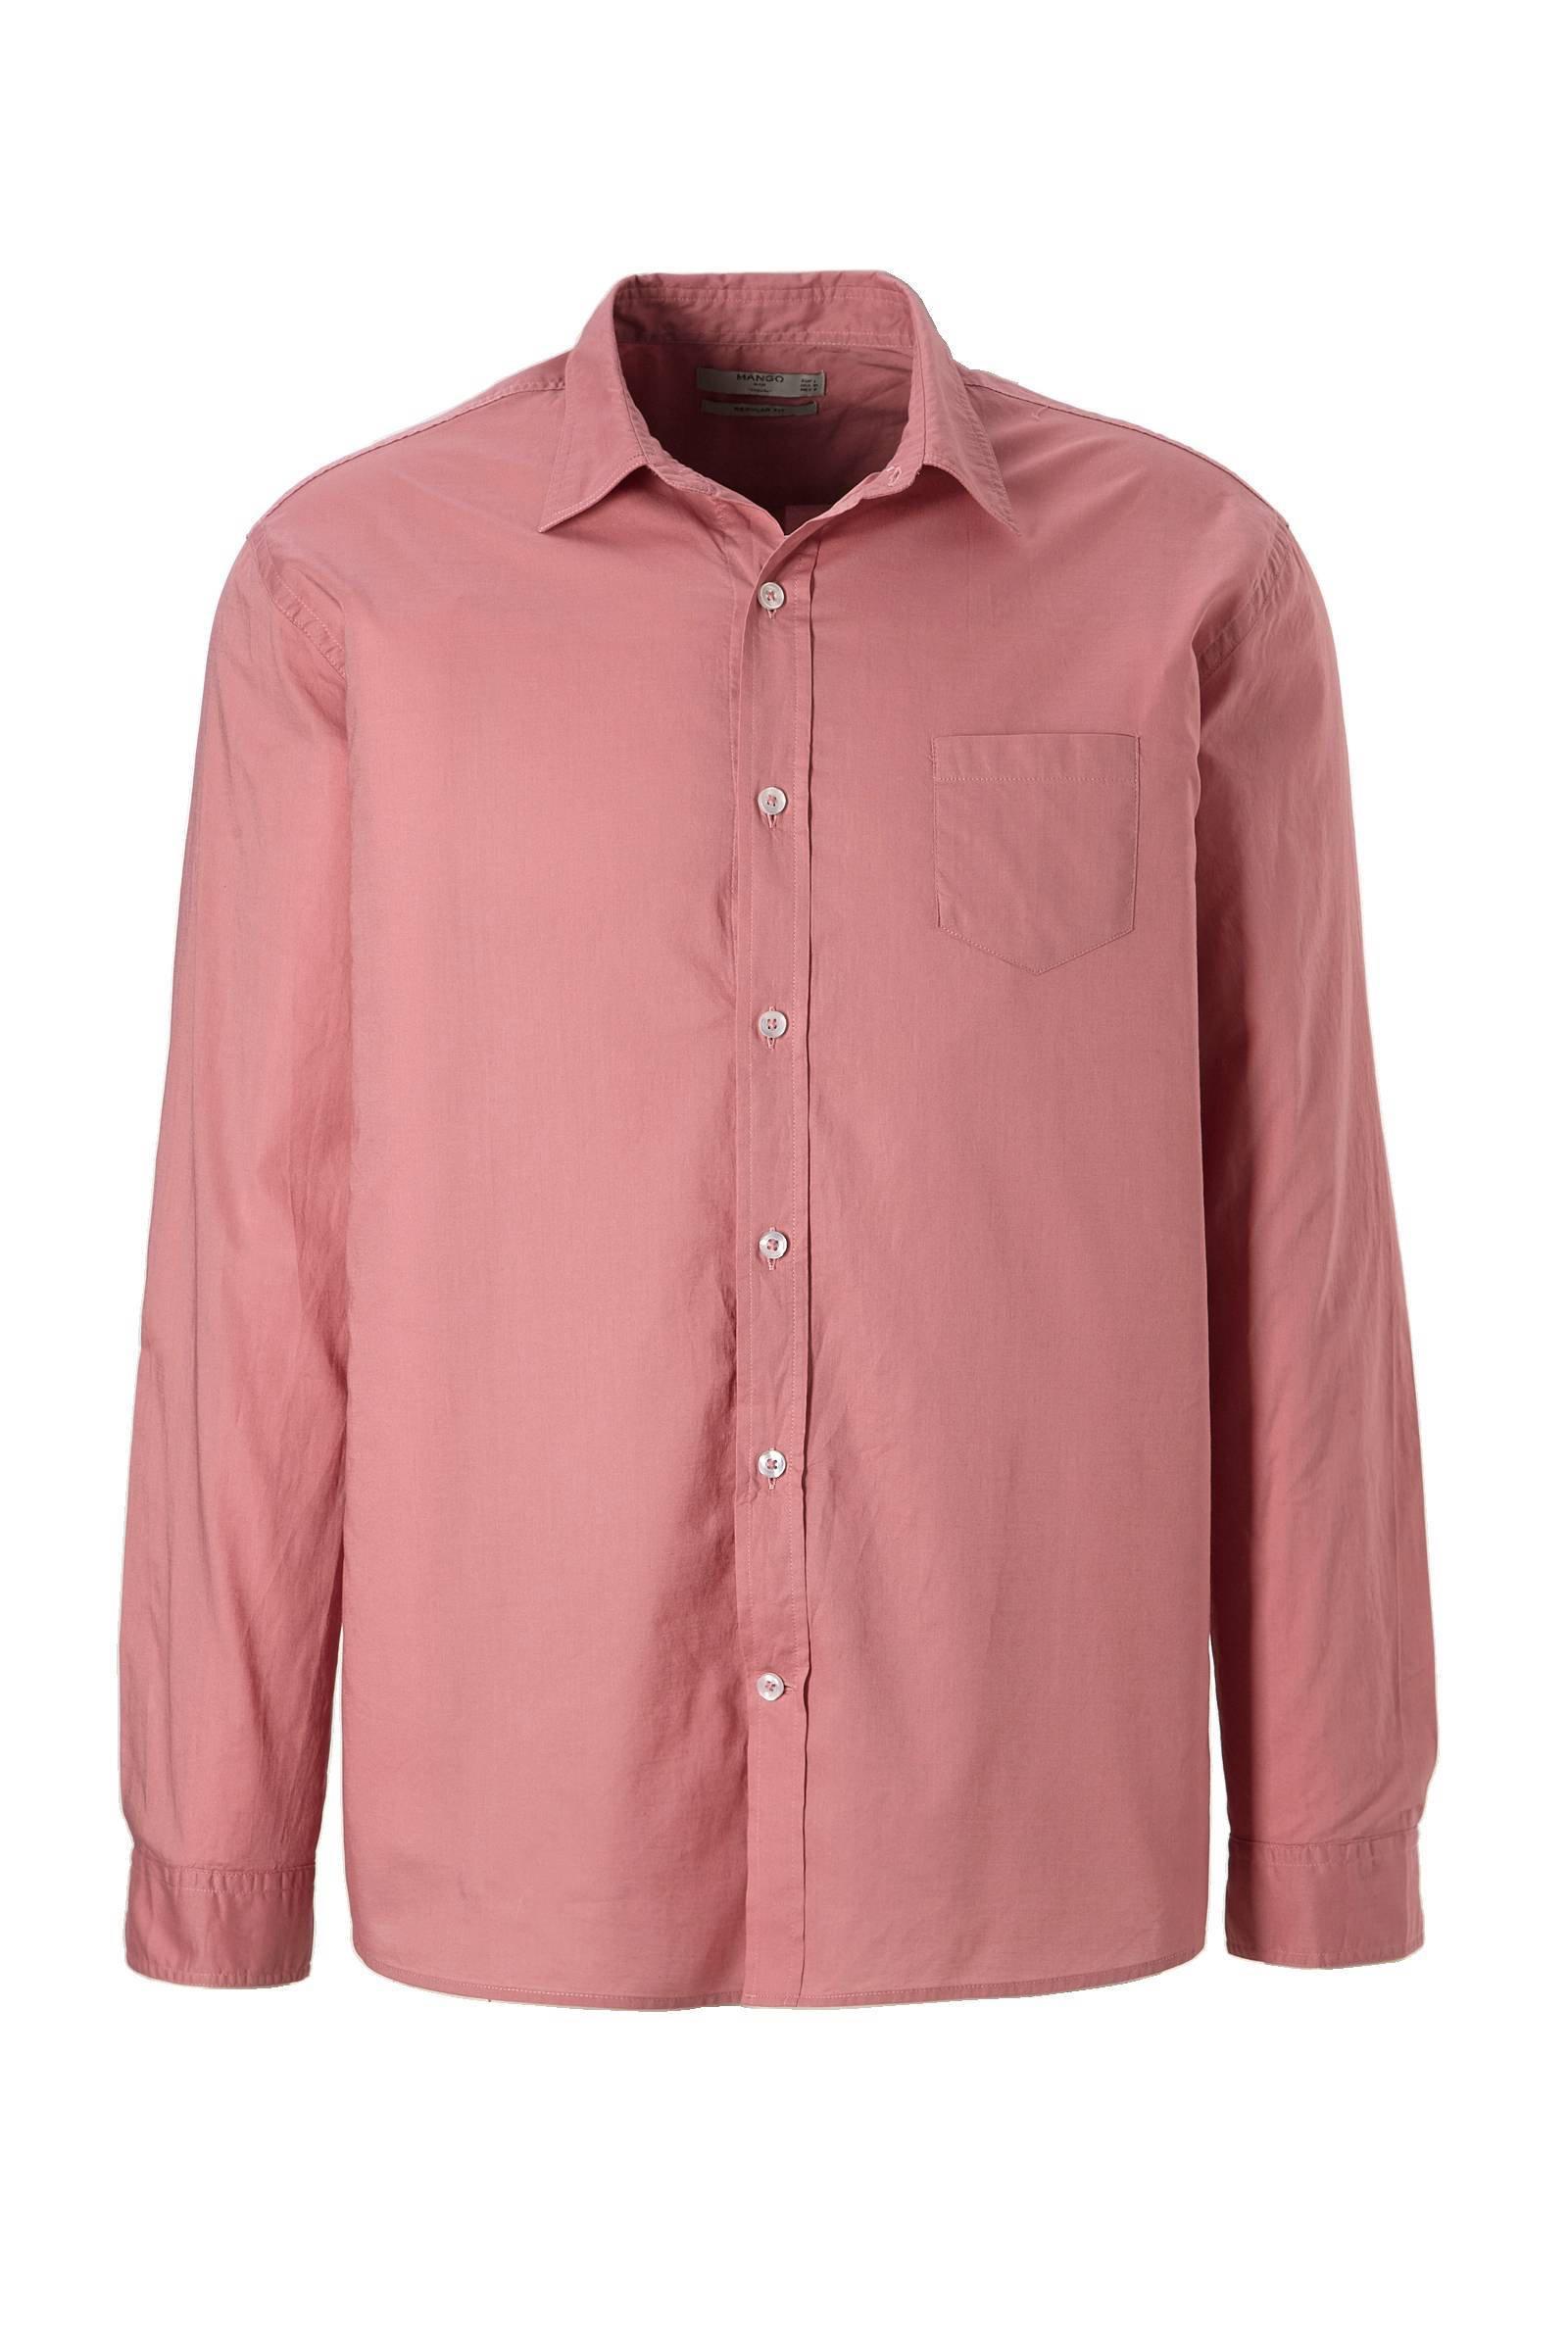 Roze Heren Overhemd.Mango Man Regular Fit Overhemd Roze Wehkamp